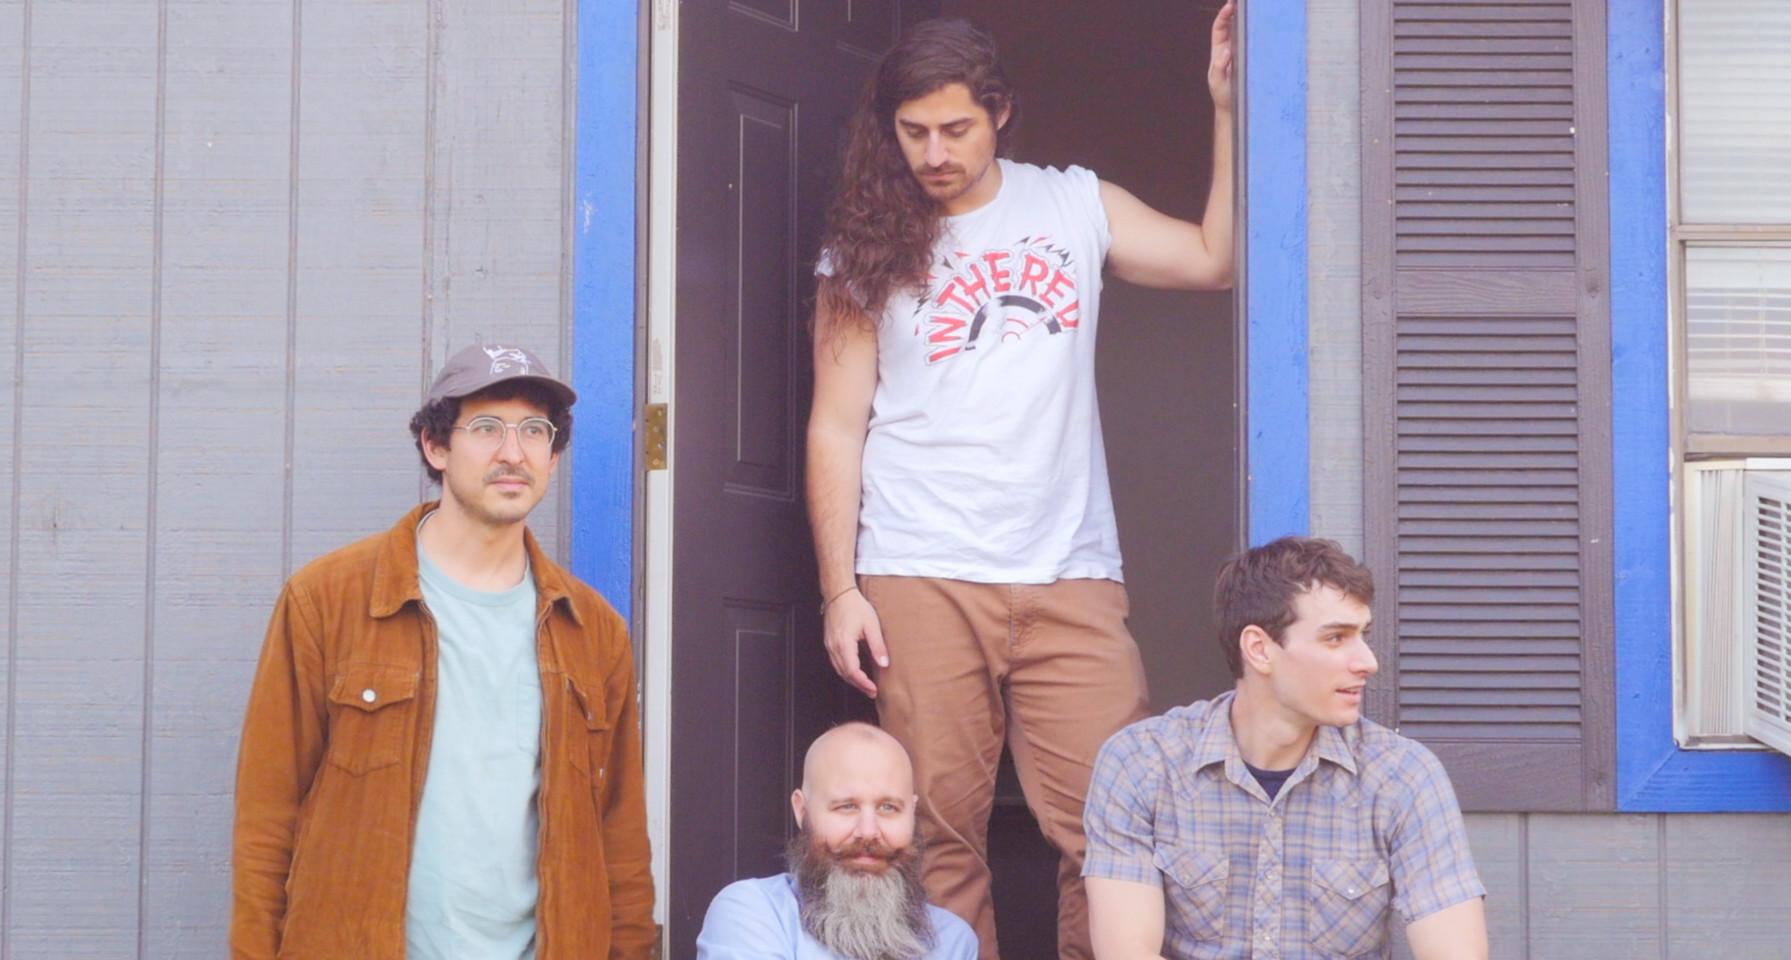 shack futon blonde band photo 4.jpg